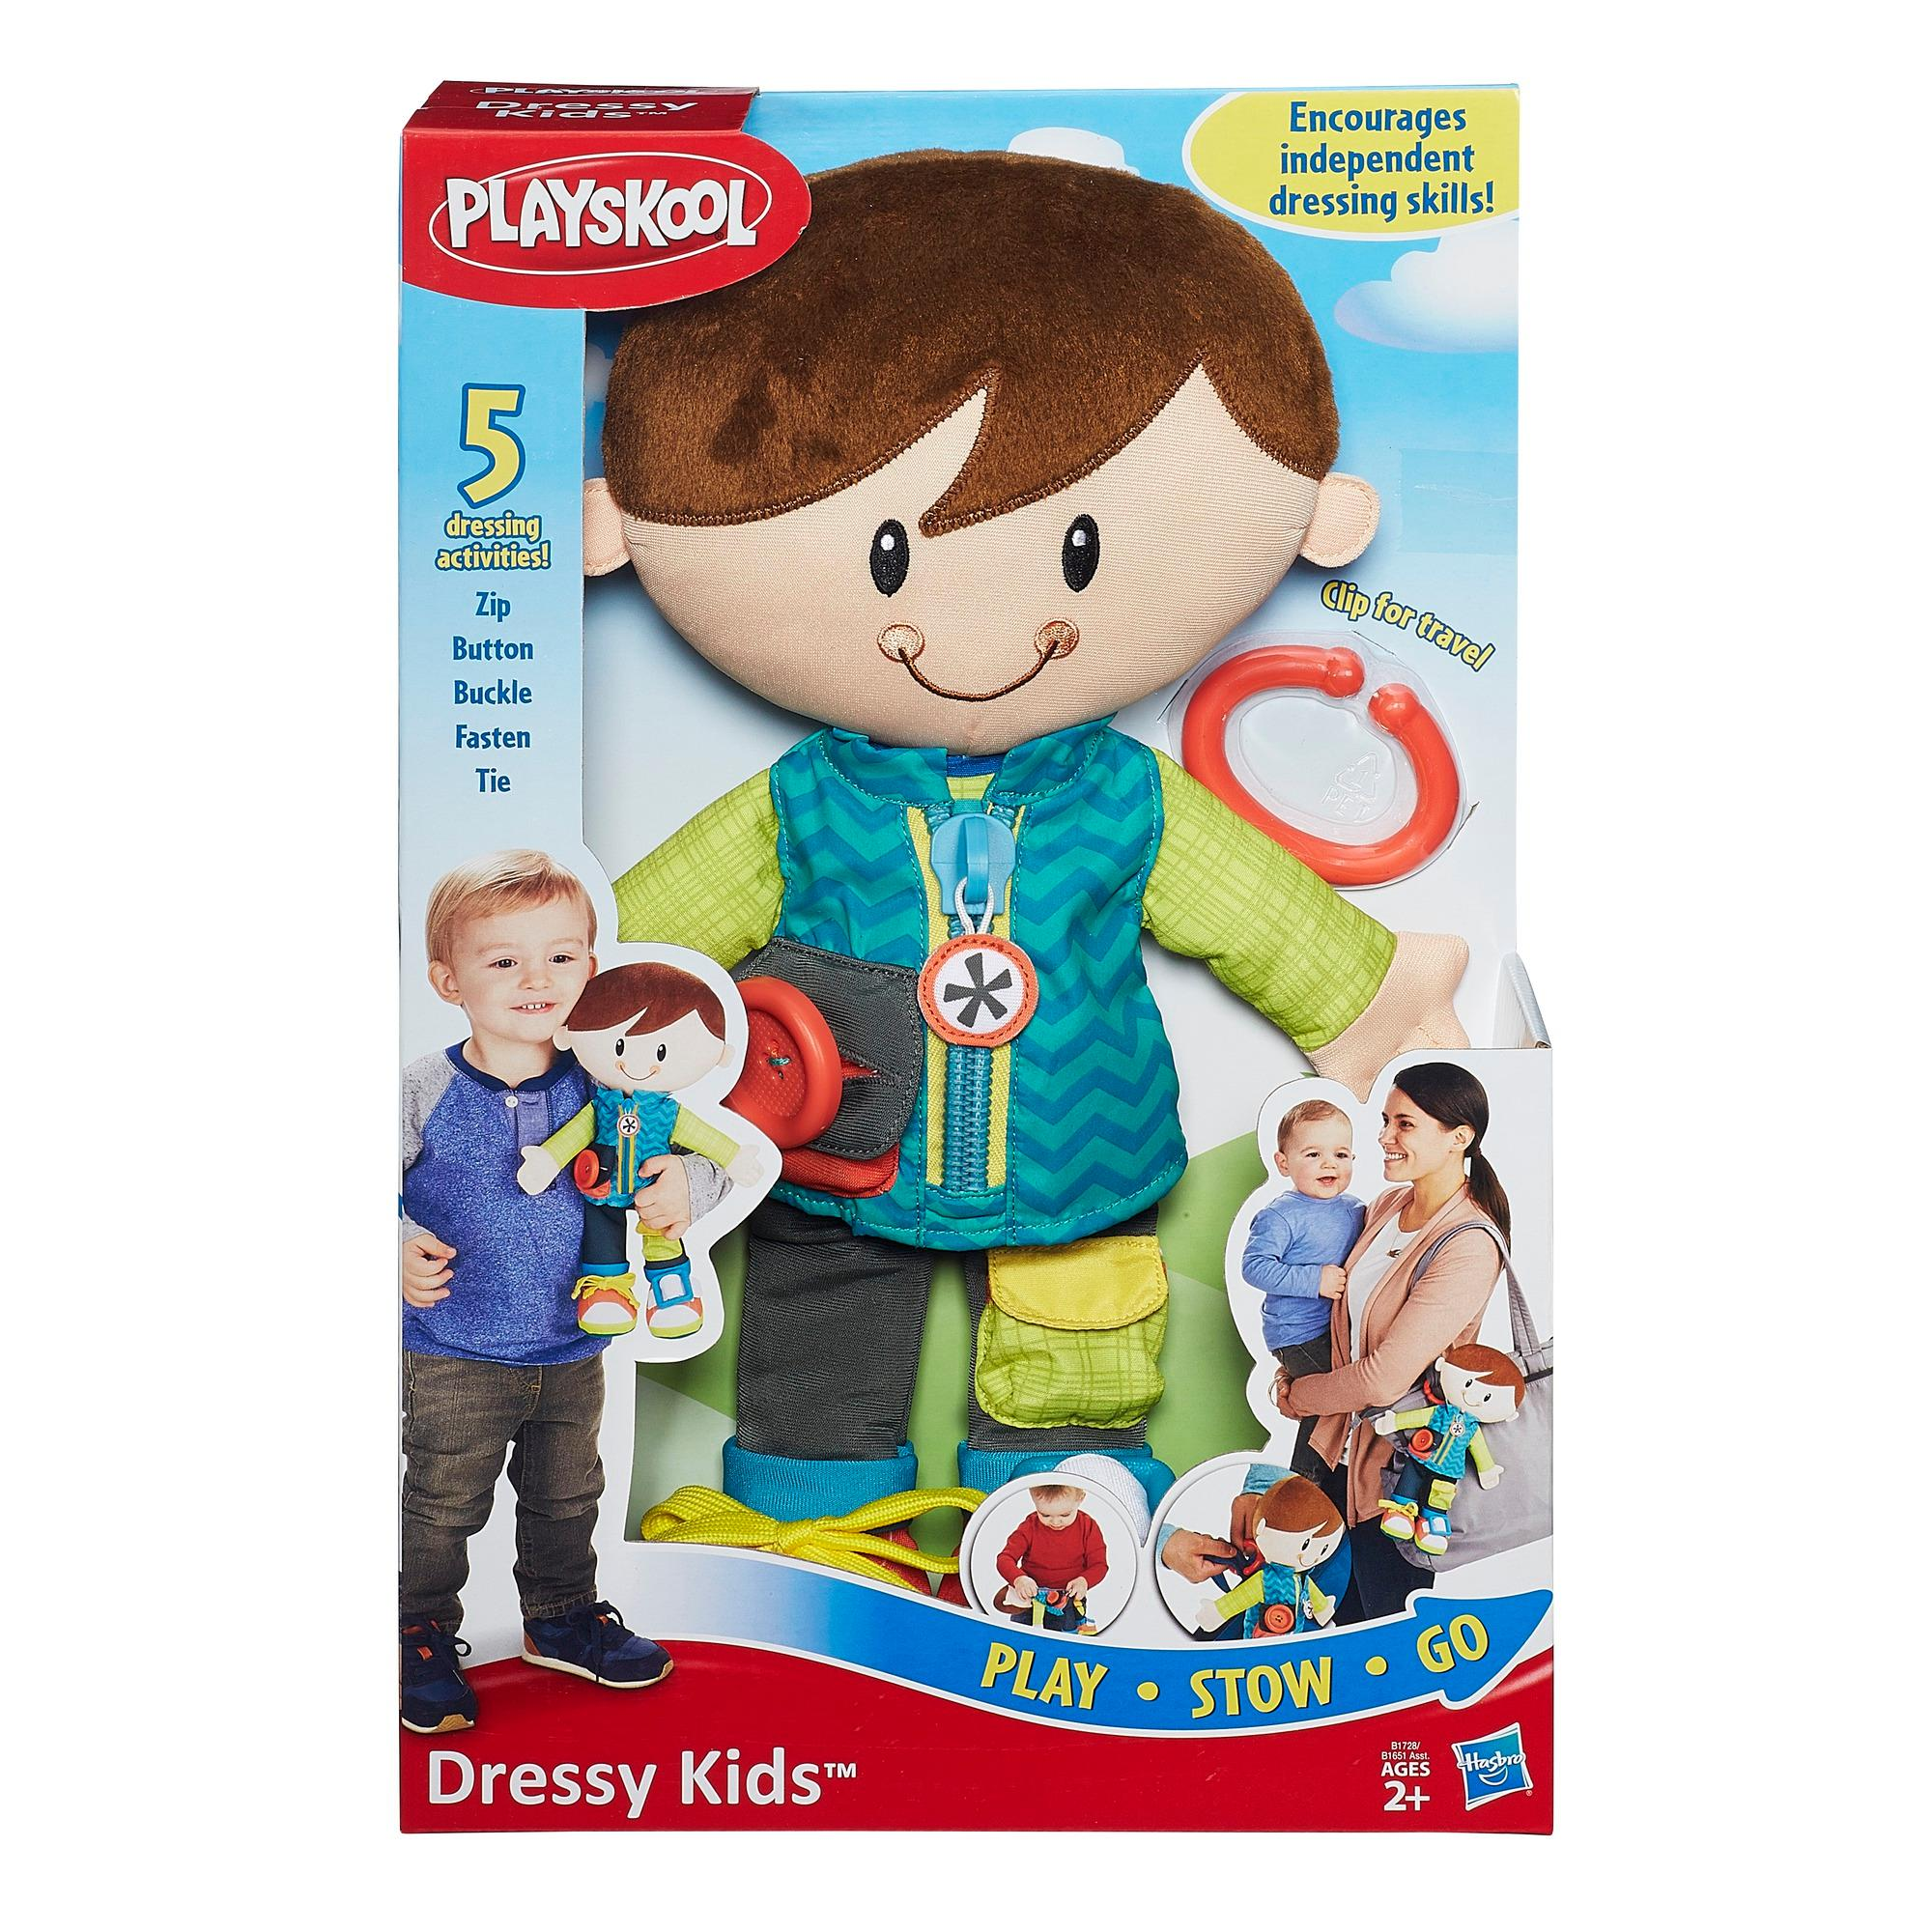 Boy Games Toy : Amazon playskool dressy kids boy toys games